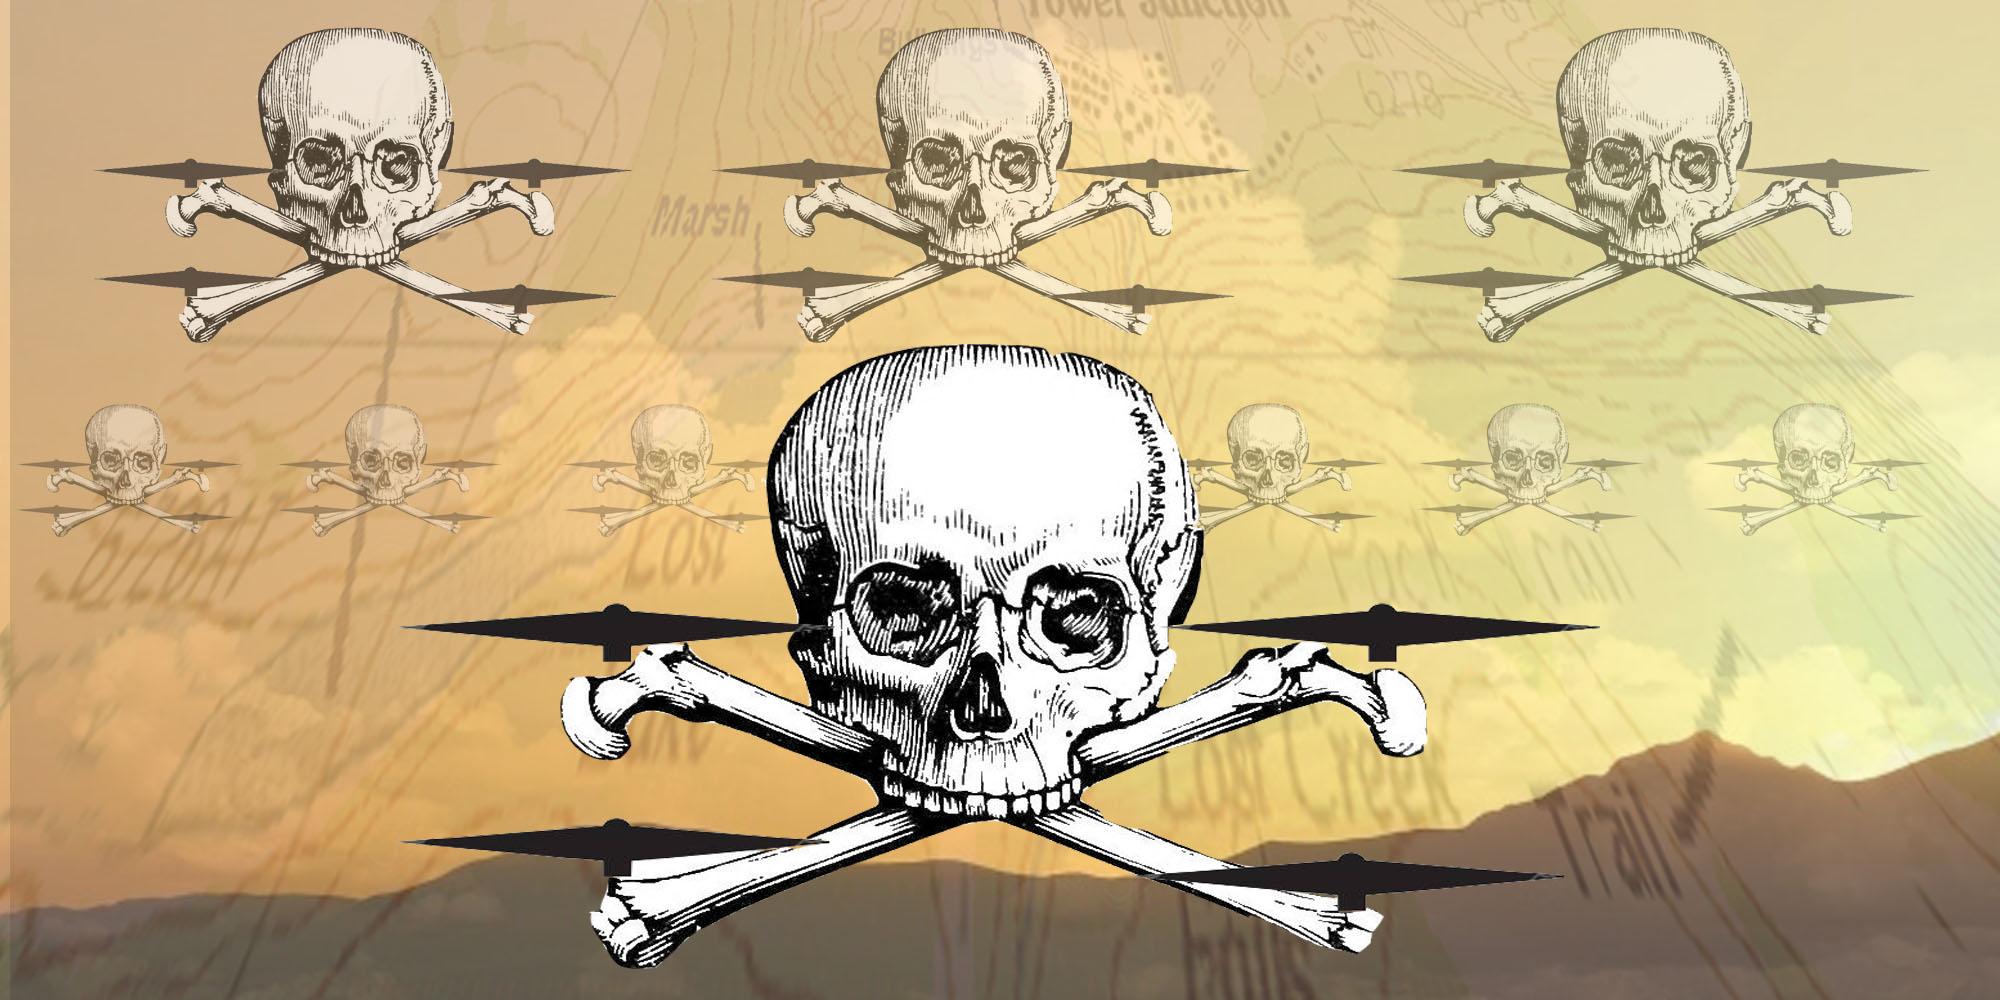 The threat of the terror drones - DroneDJ